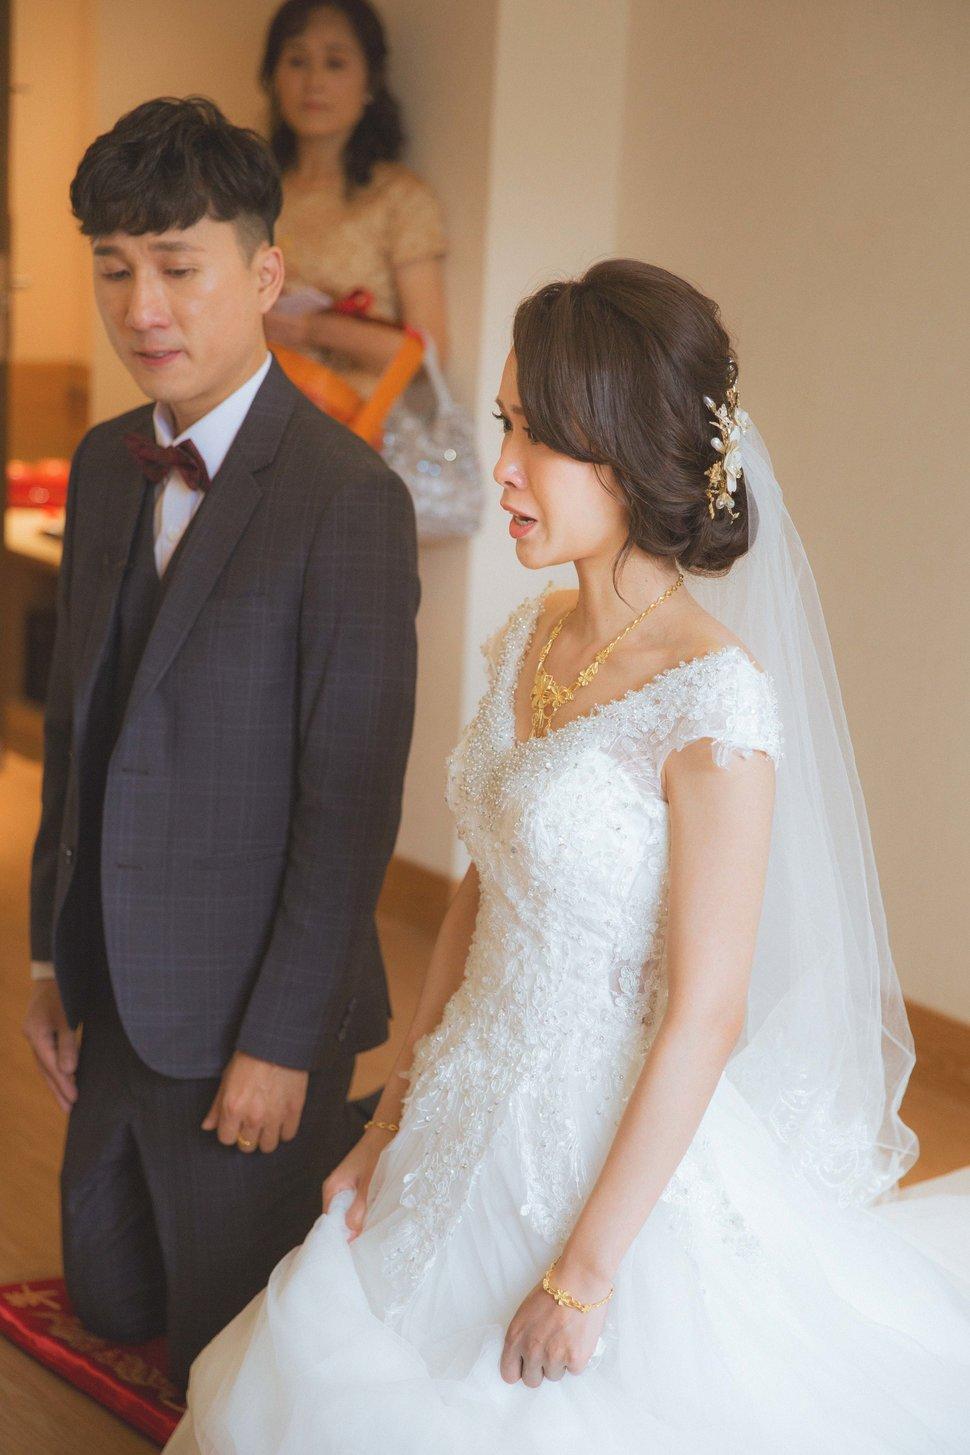 69 - 王竫 Photographer《結婚吧》